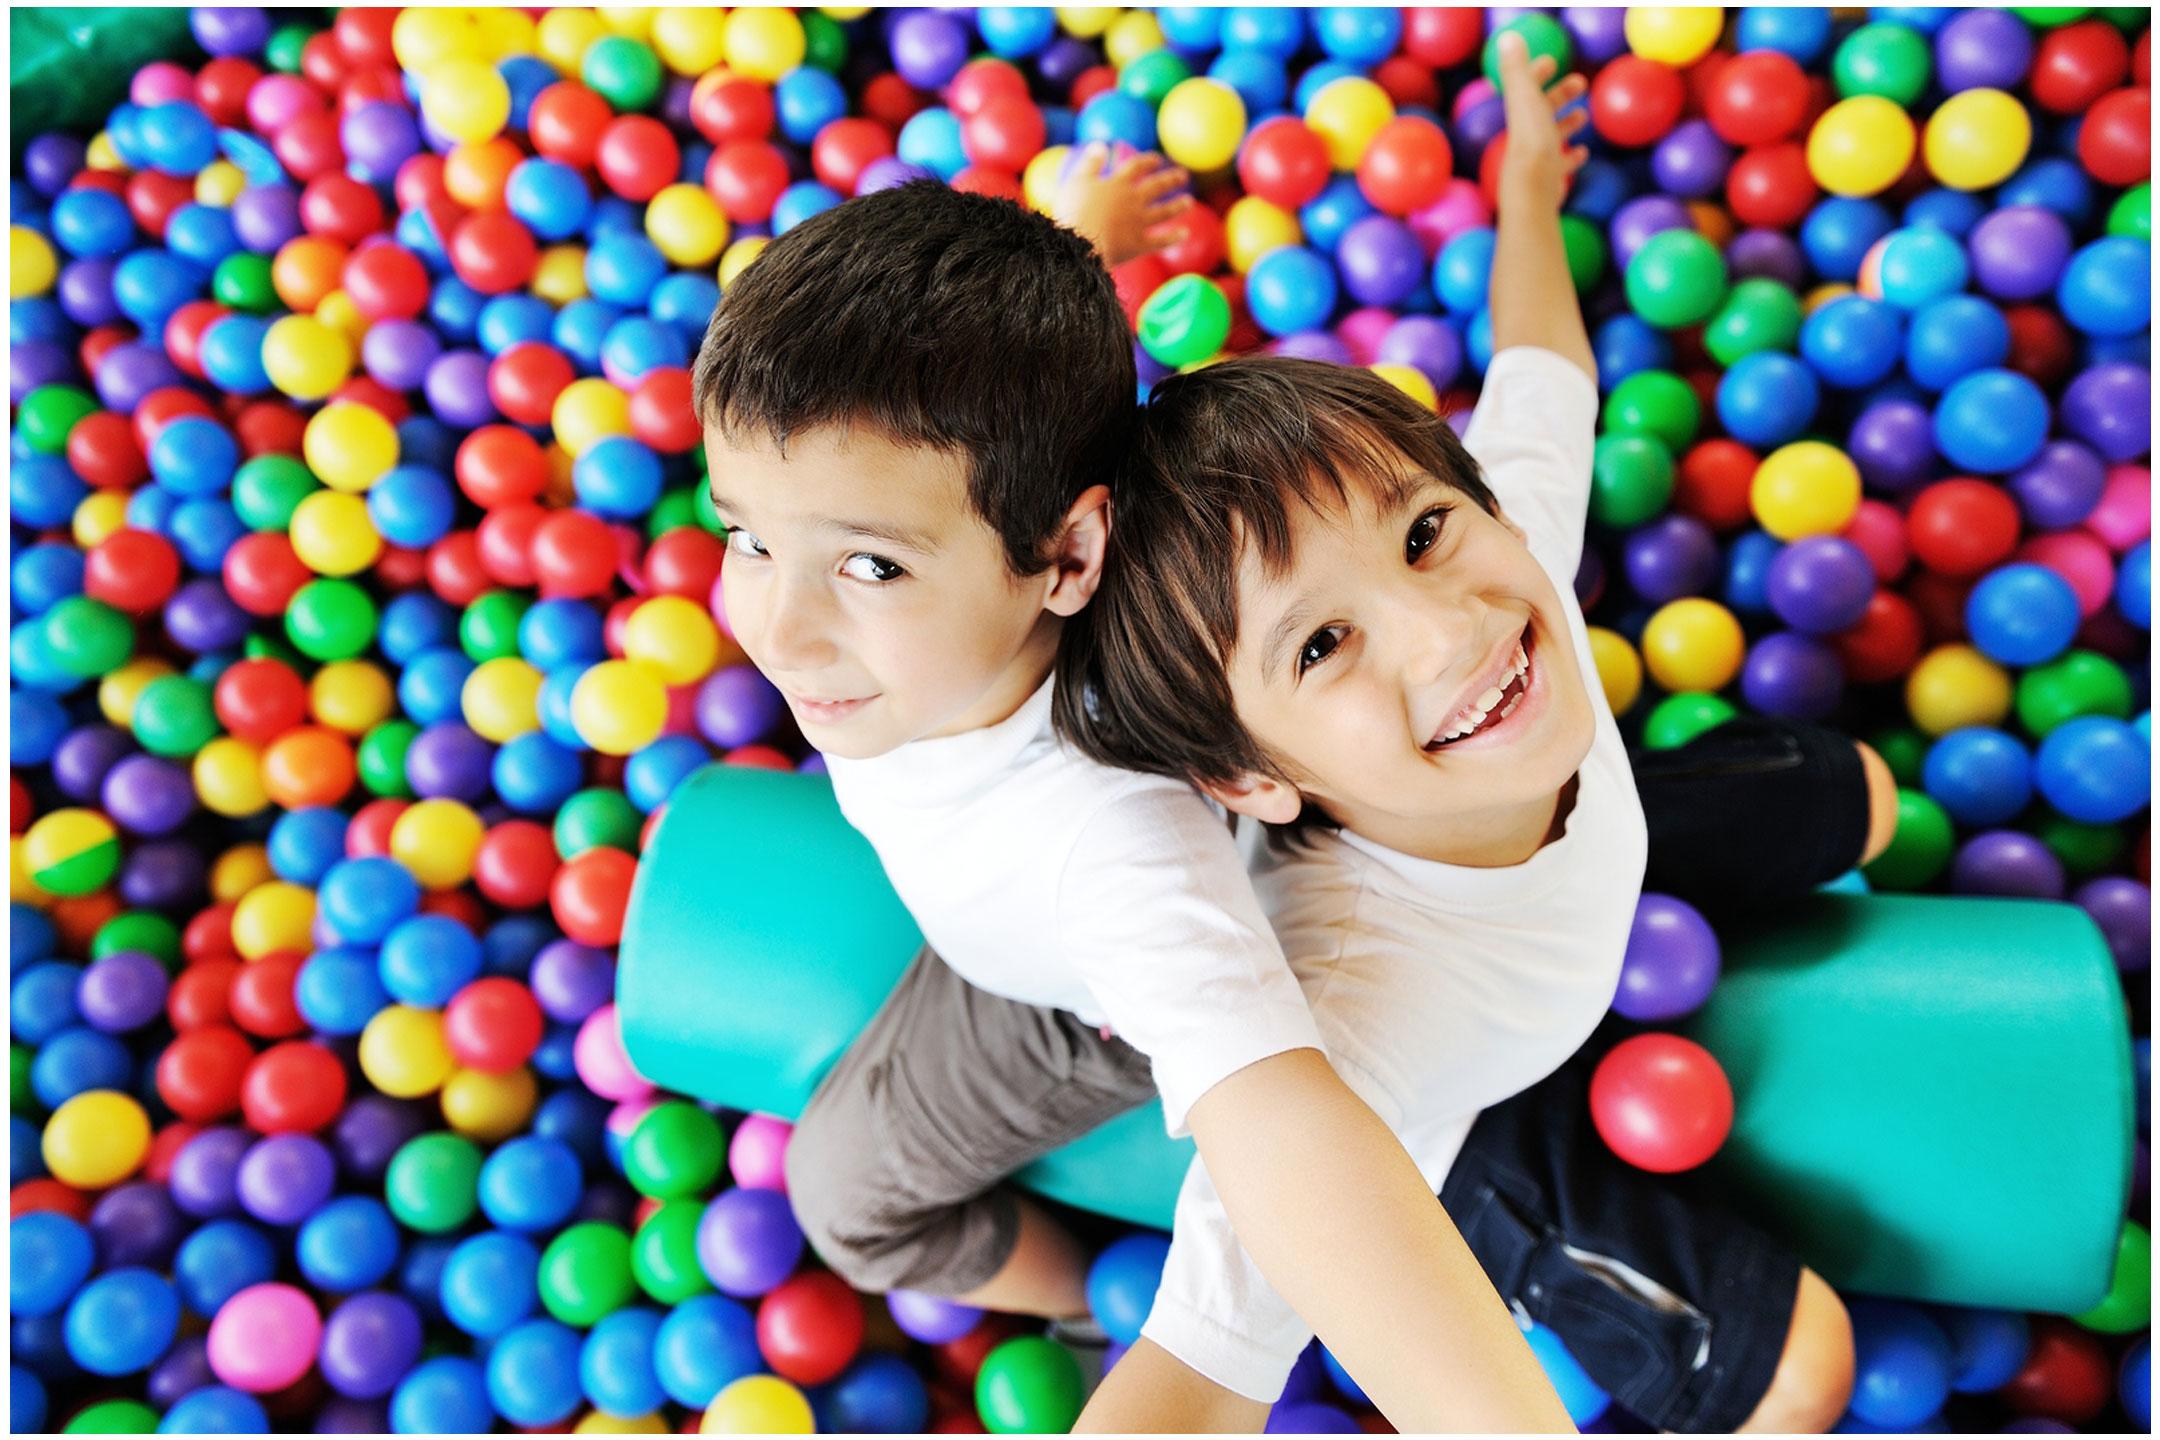 smiling-boys-playing-in-ballpool2160